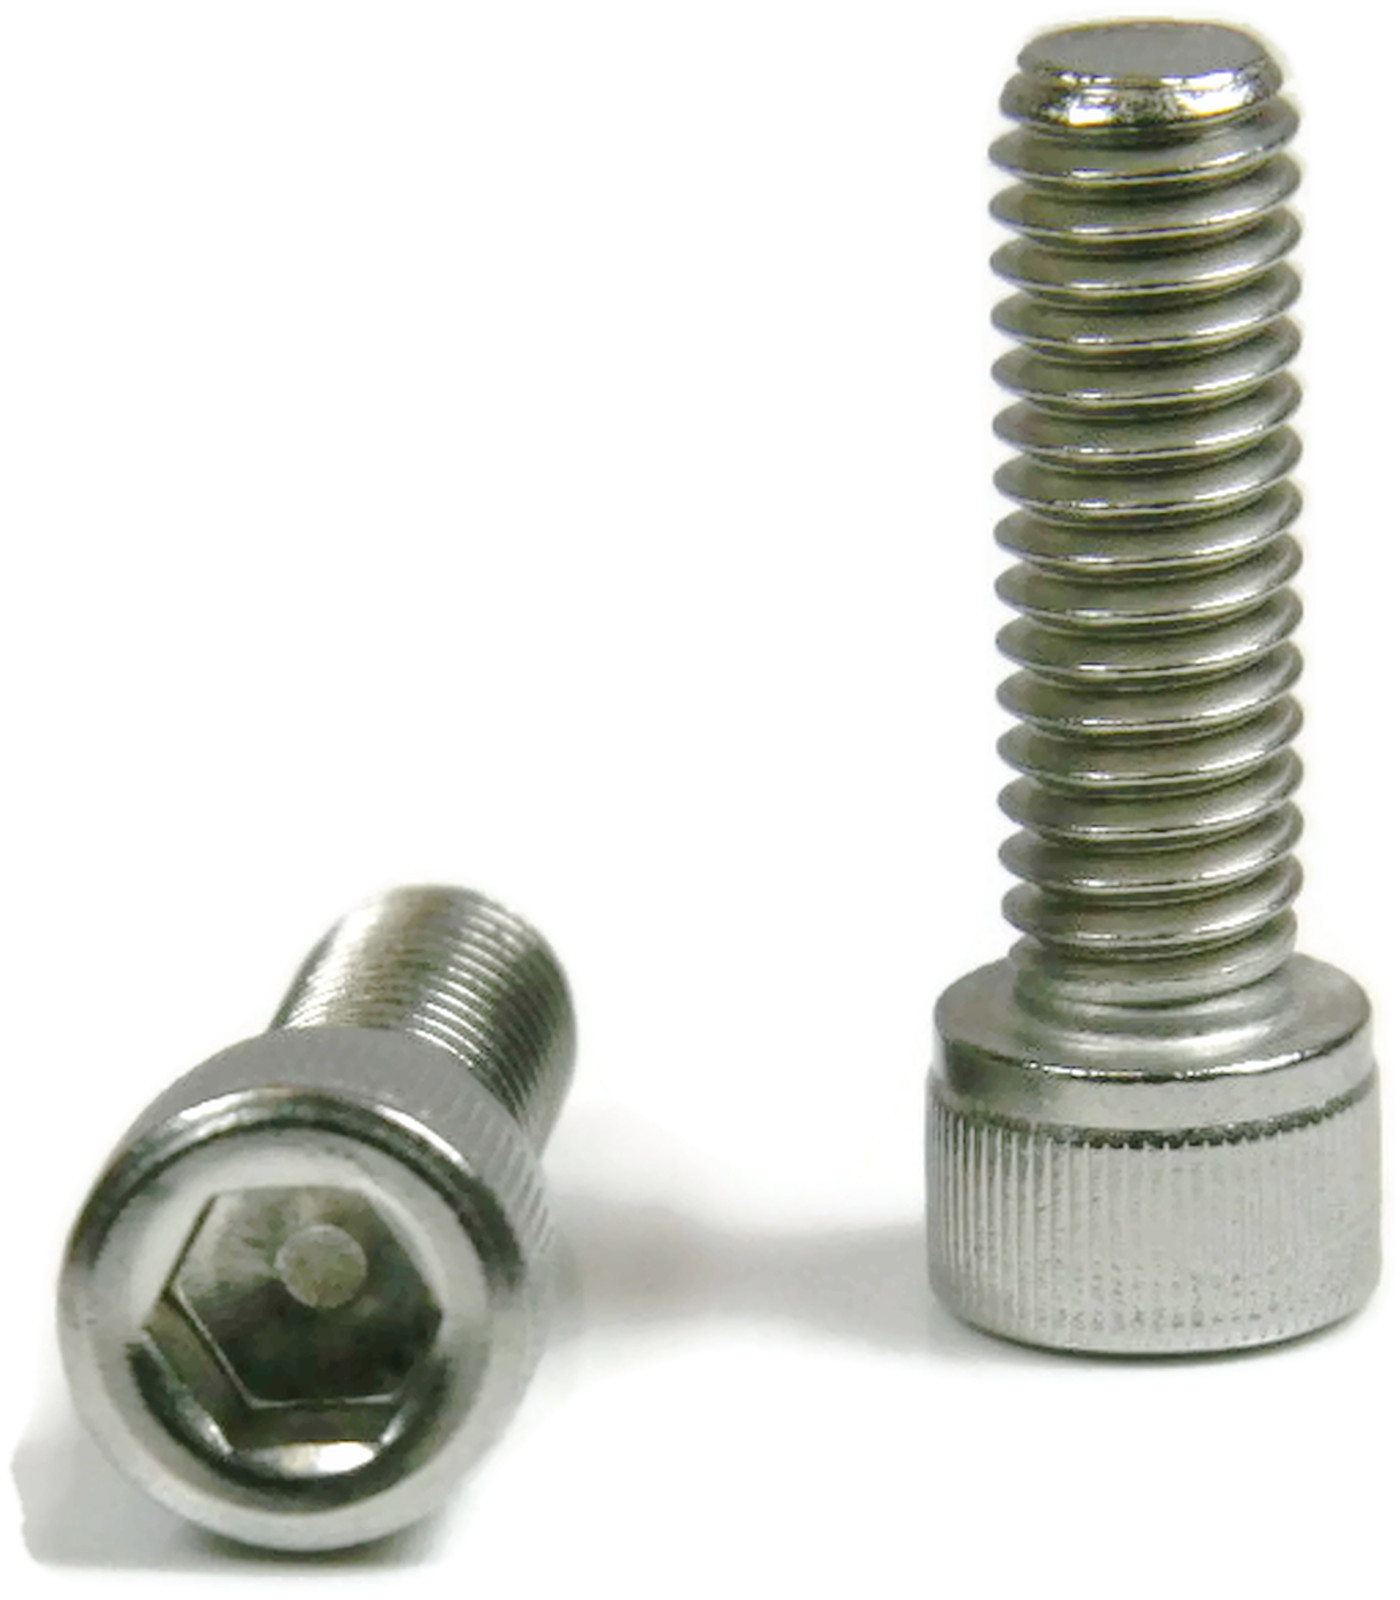 Flat Head Socket Cap Screw 10-24 x 5//8 100 each